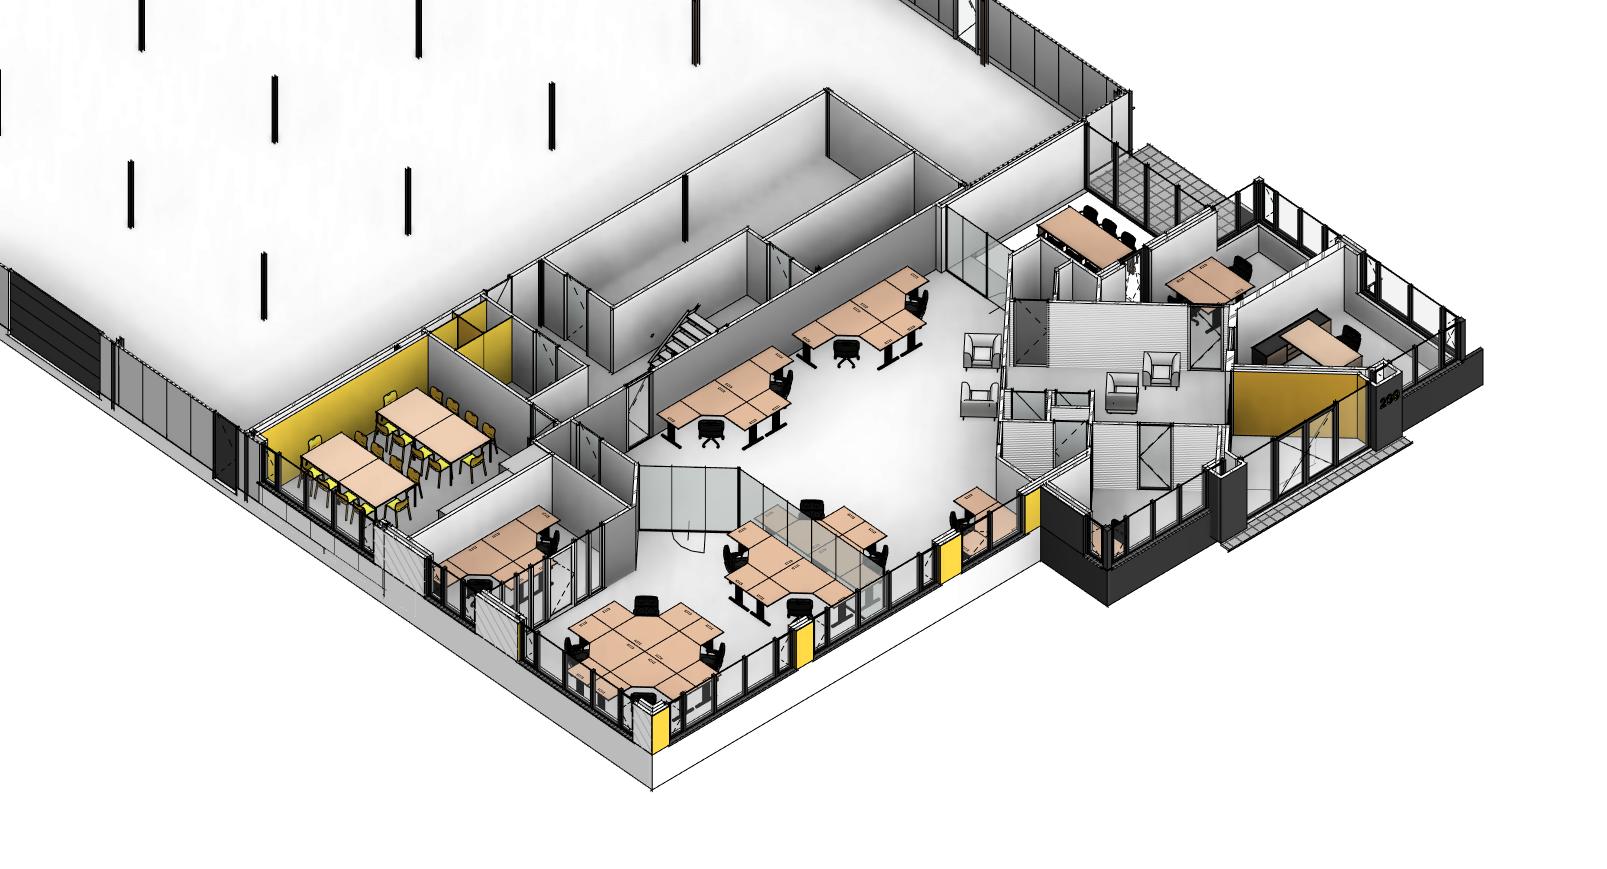 tyro-remote-bedrijfspand-almelo-architect-facelift-van-oord-architectuur-en-design_3